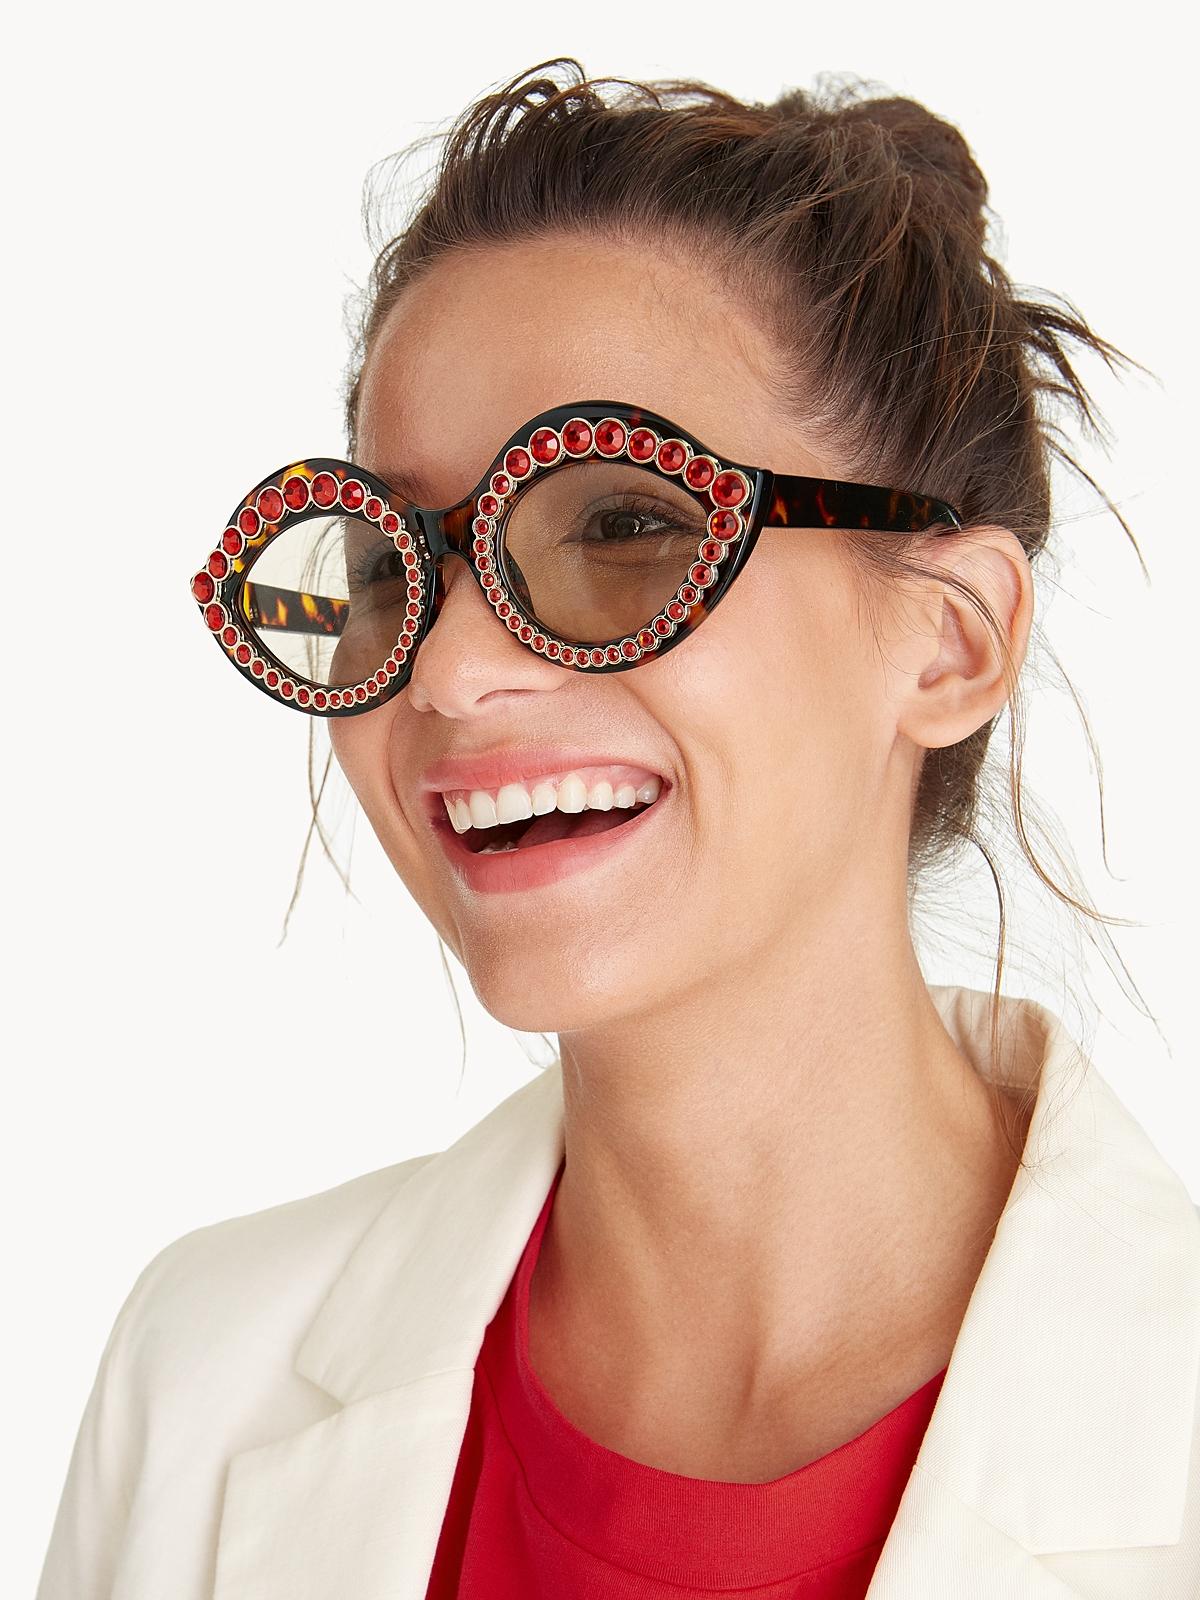 ee0d3f00f1b10 Cat Eye Embellished Sunglasses - Red - Pomelo Fashion